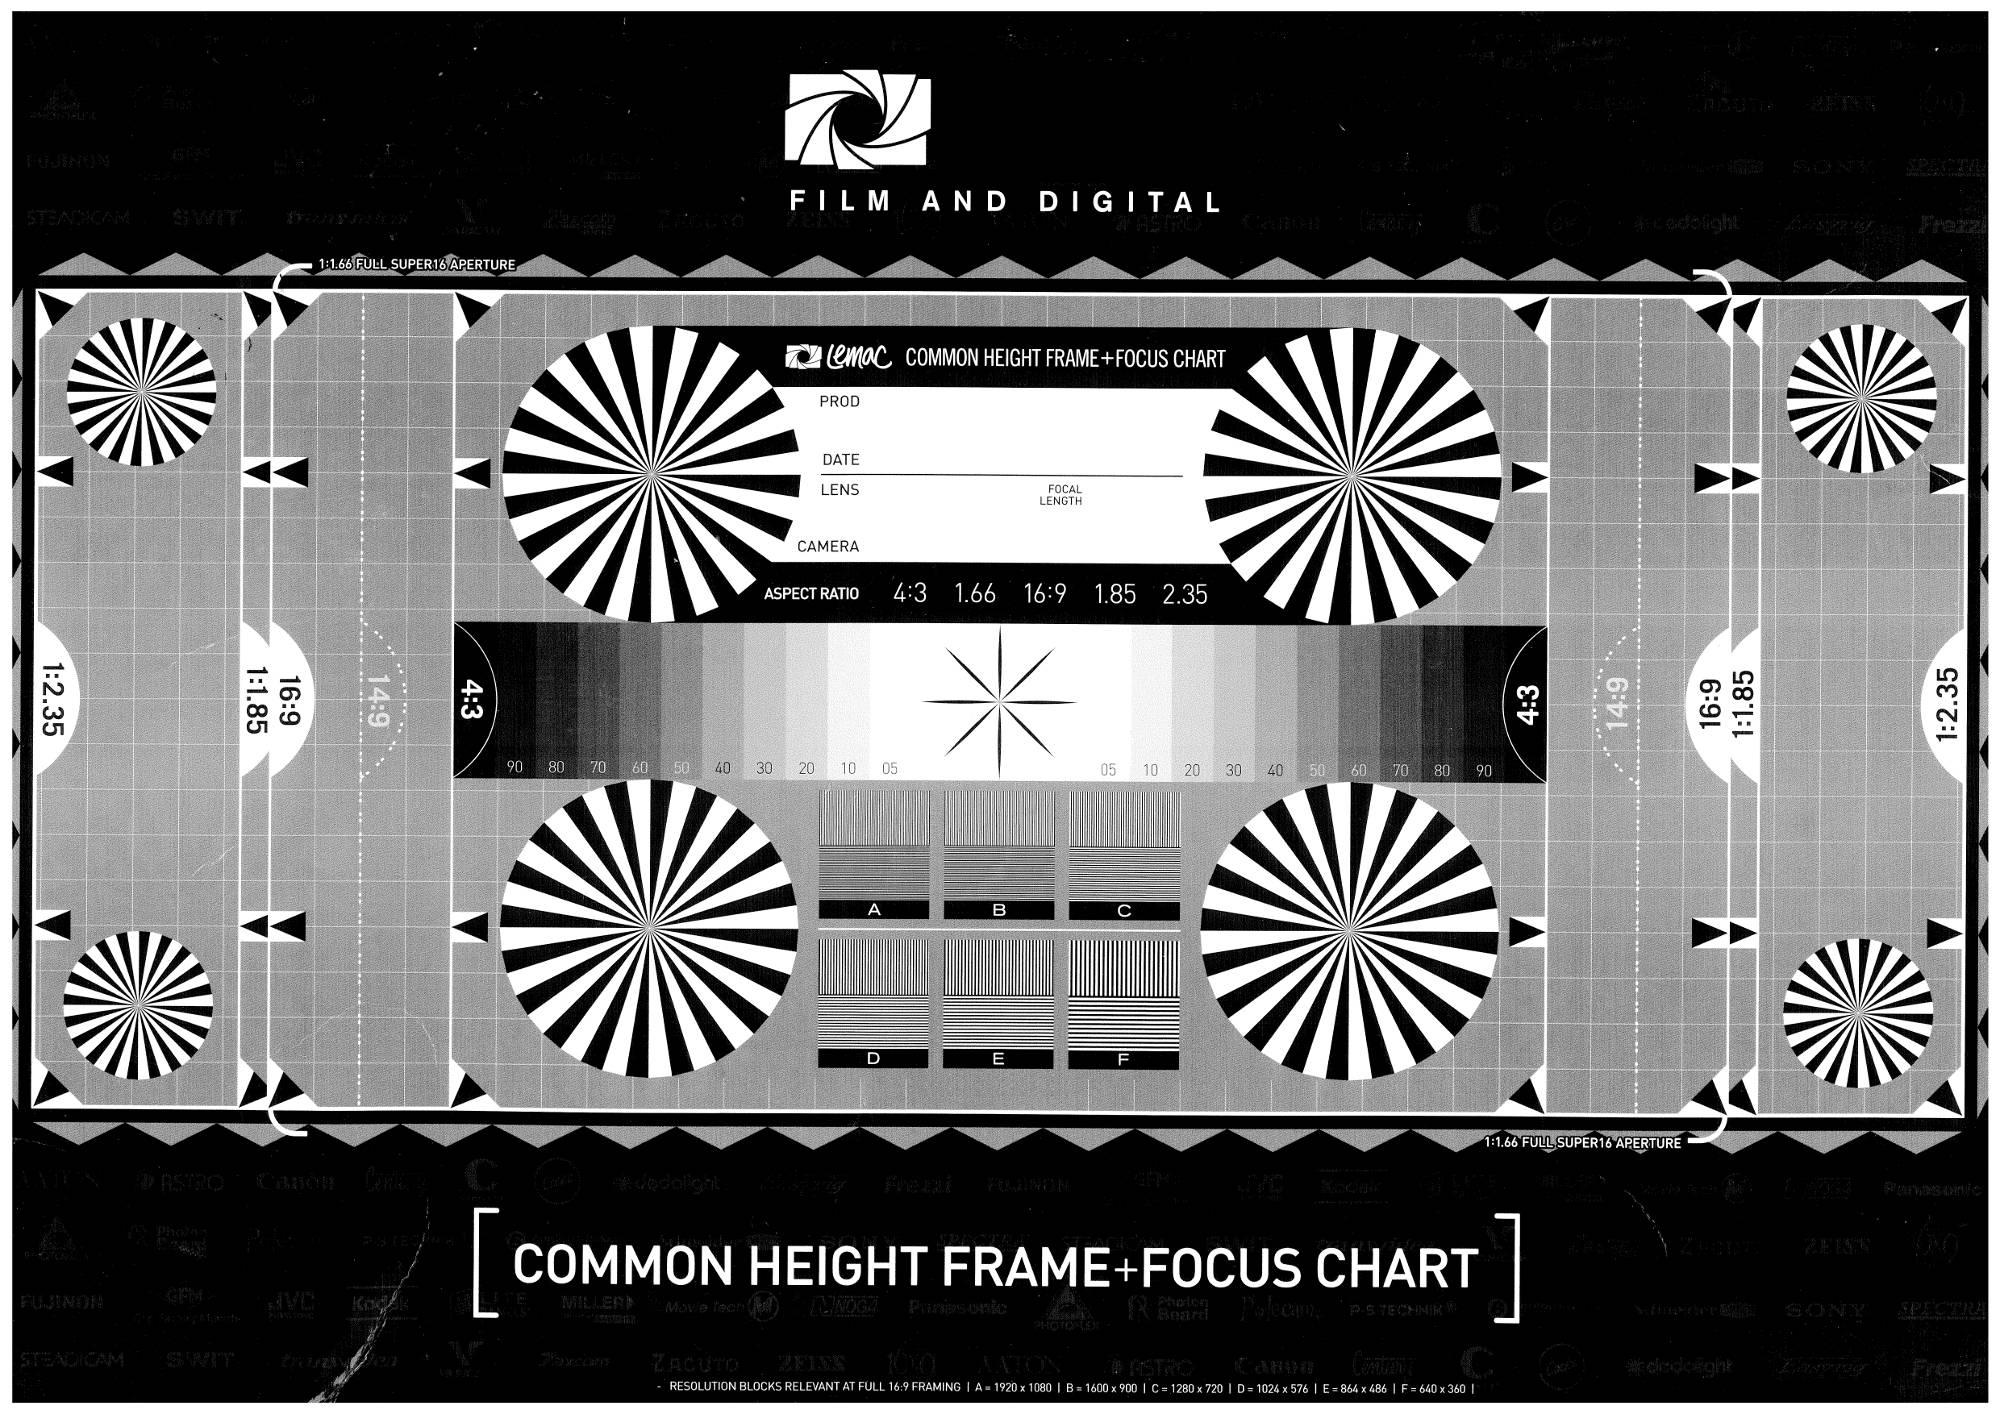 LEMAC-filmAndDigital_chart_scale2000